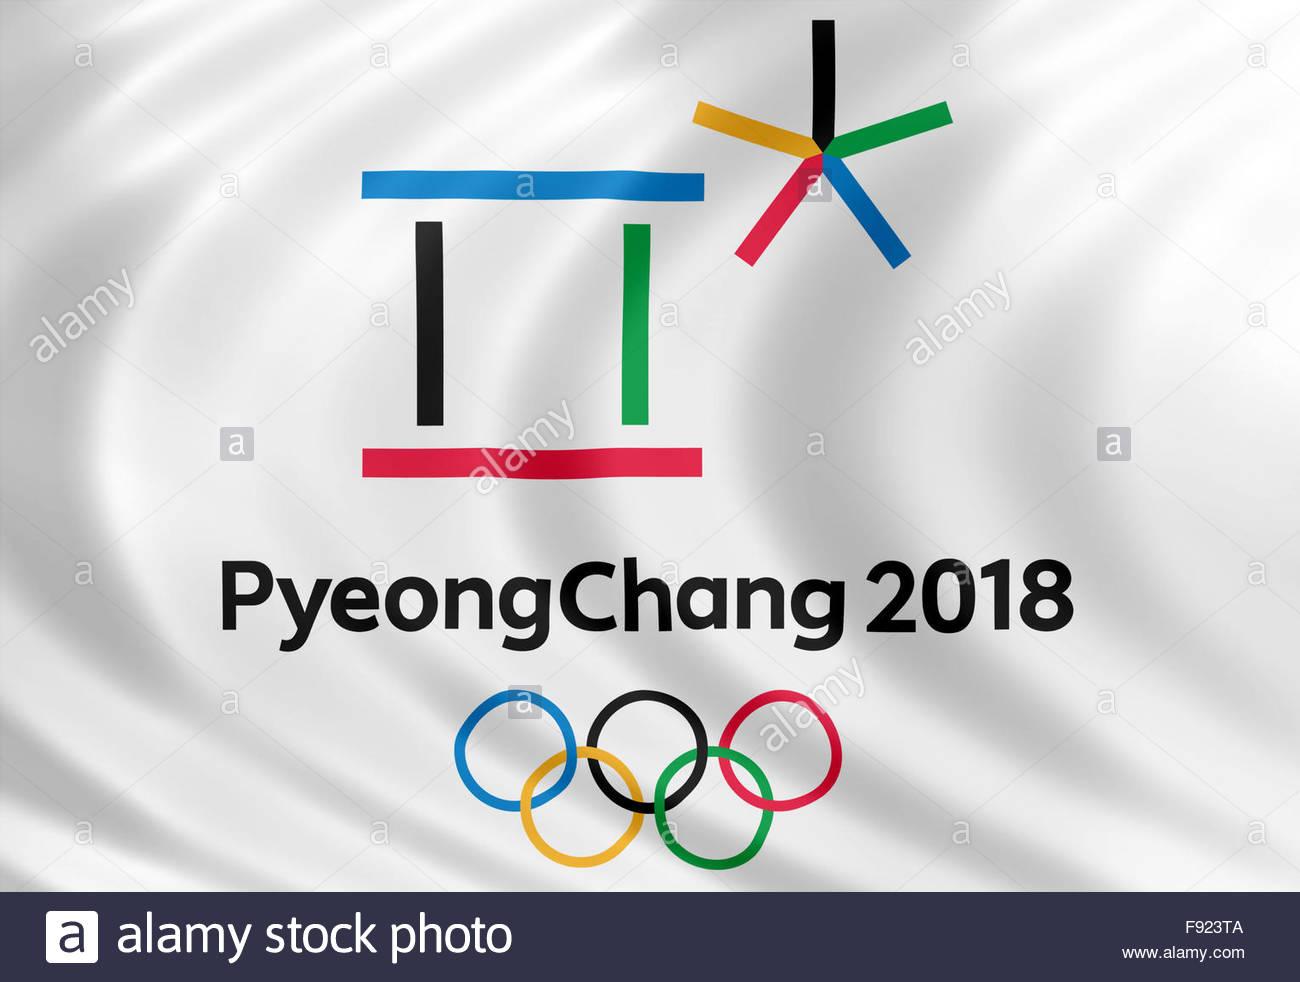 Pyeongchang 2018 Olympic Games logo icon flag Stock Photo 1300x982